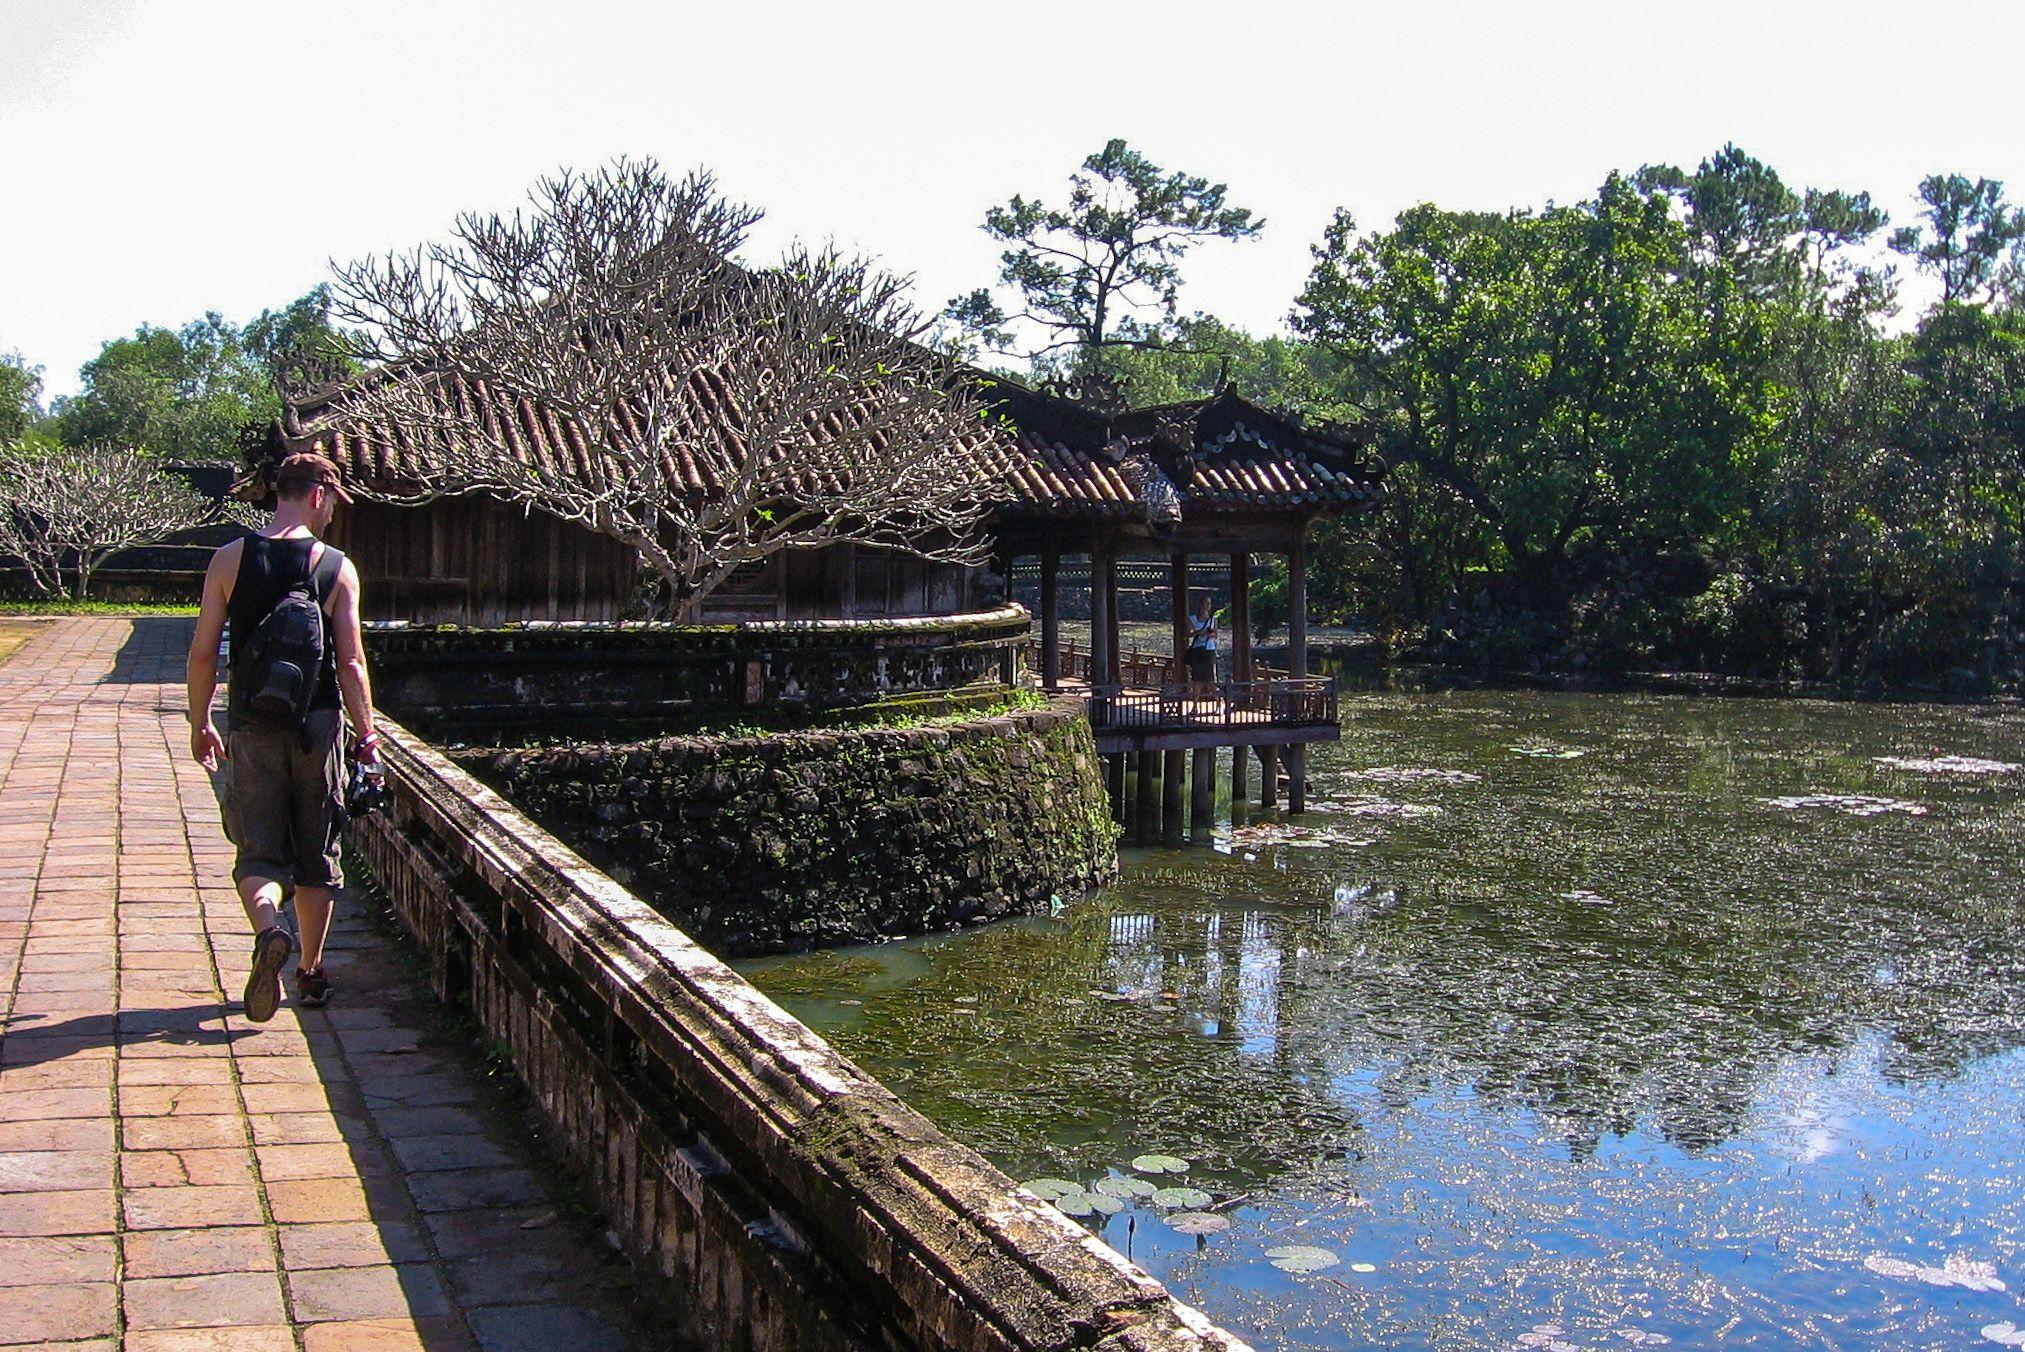 Luu Khiem Lake, Tu Duc Royal Tomb, Hue, Vietnam.